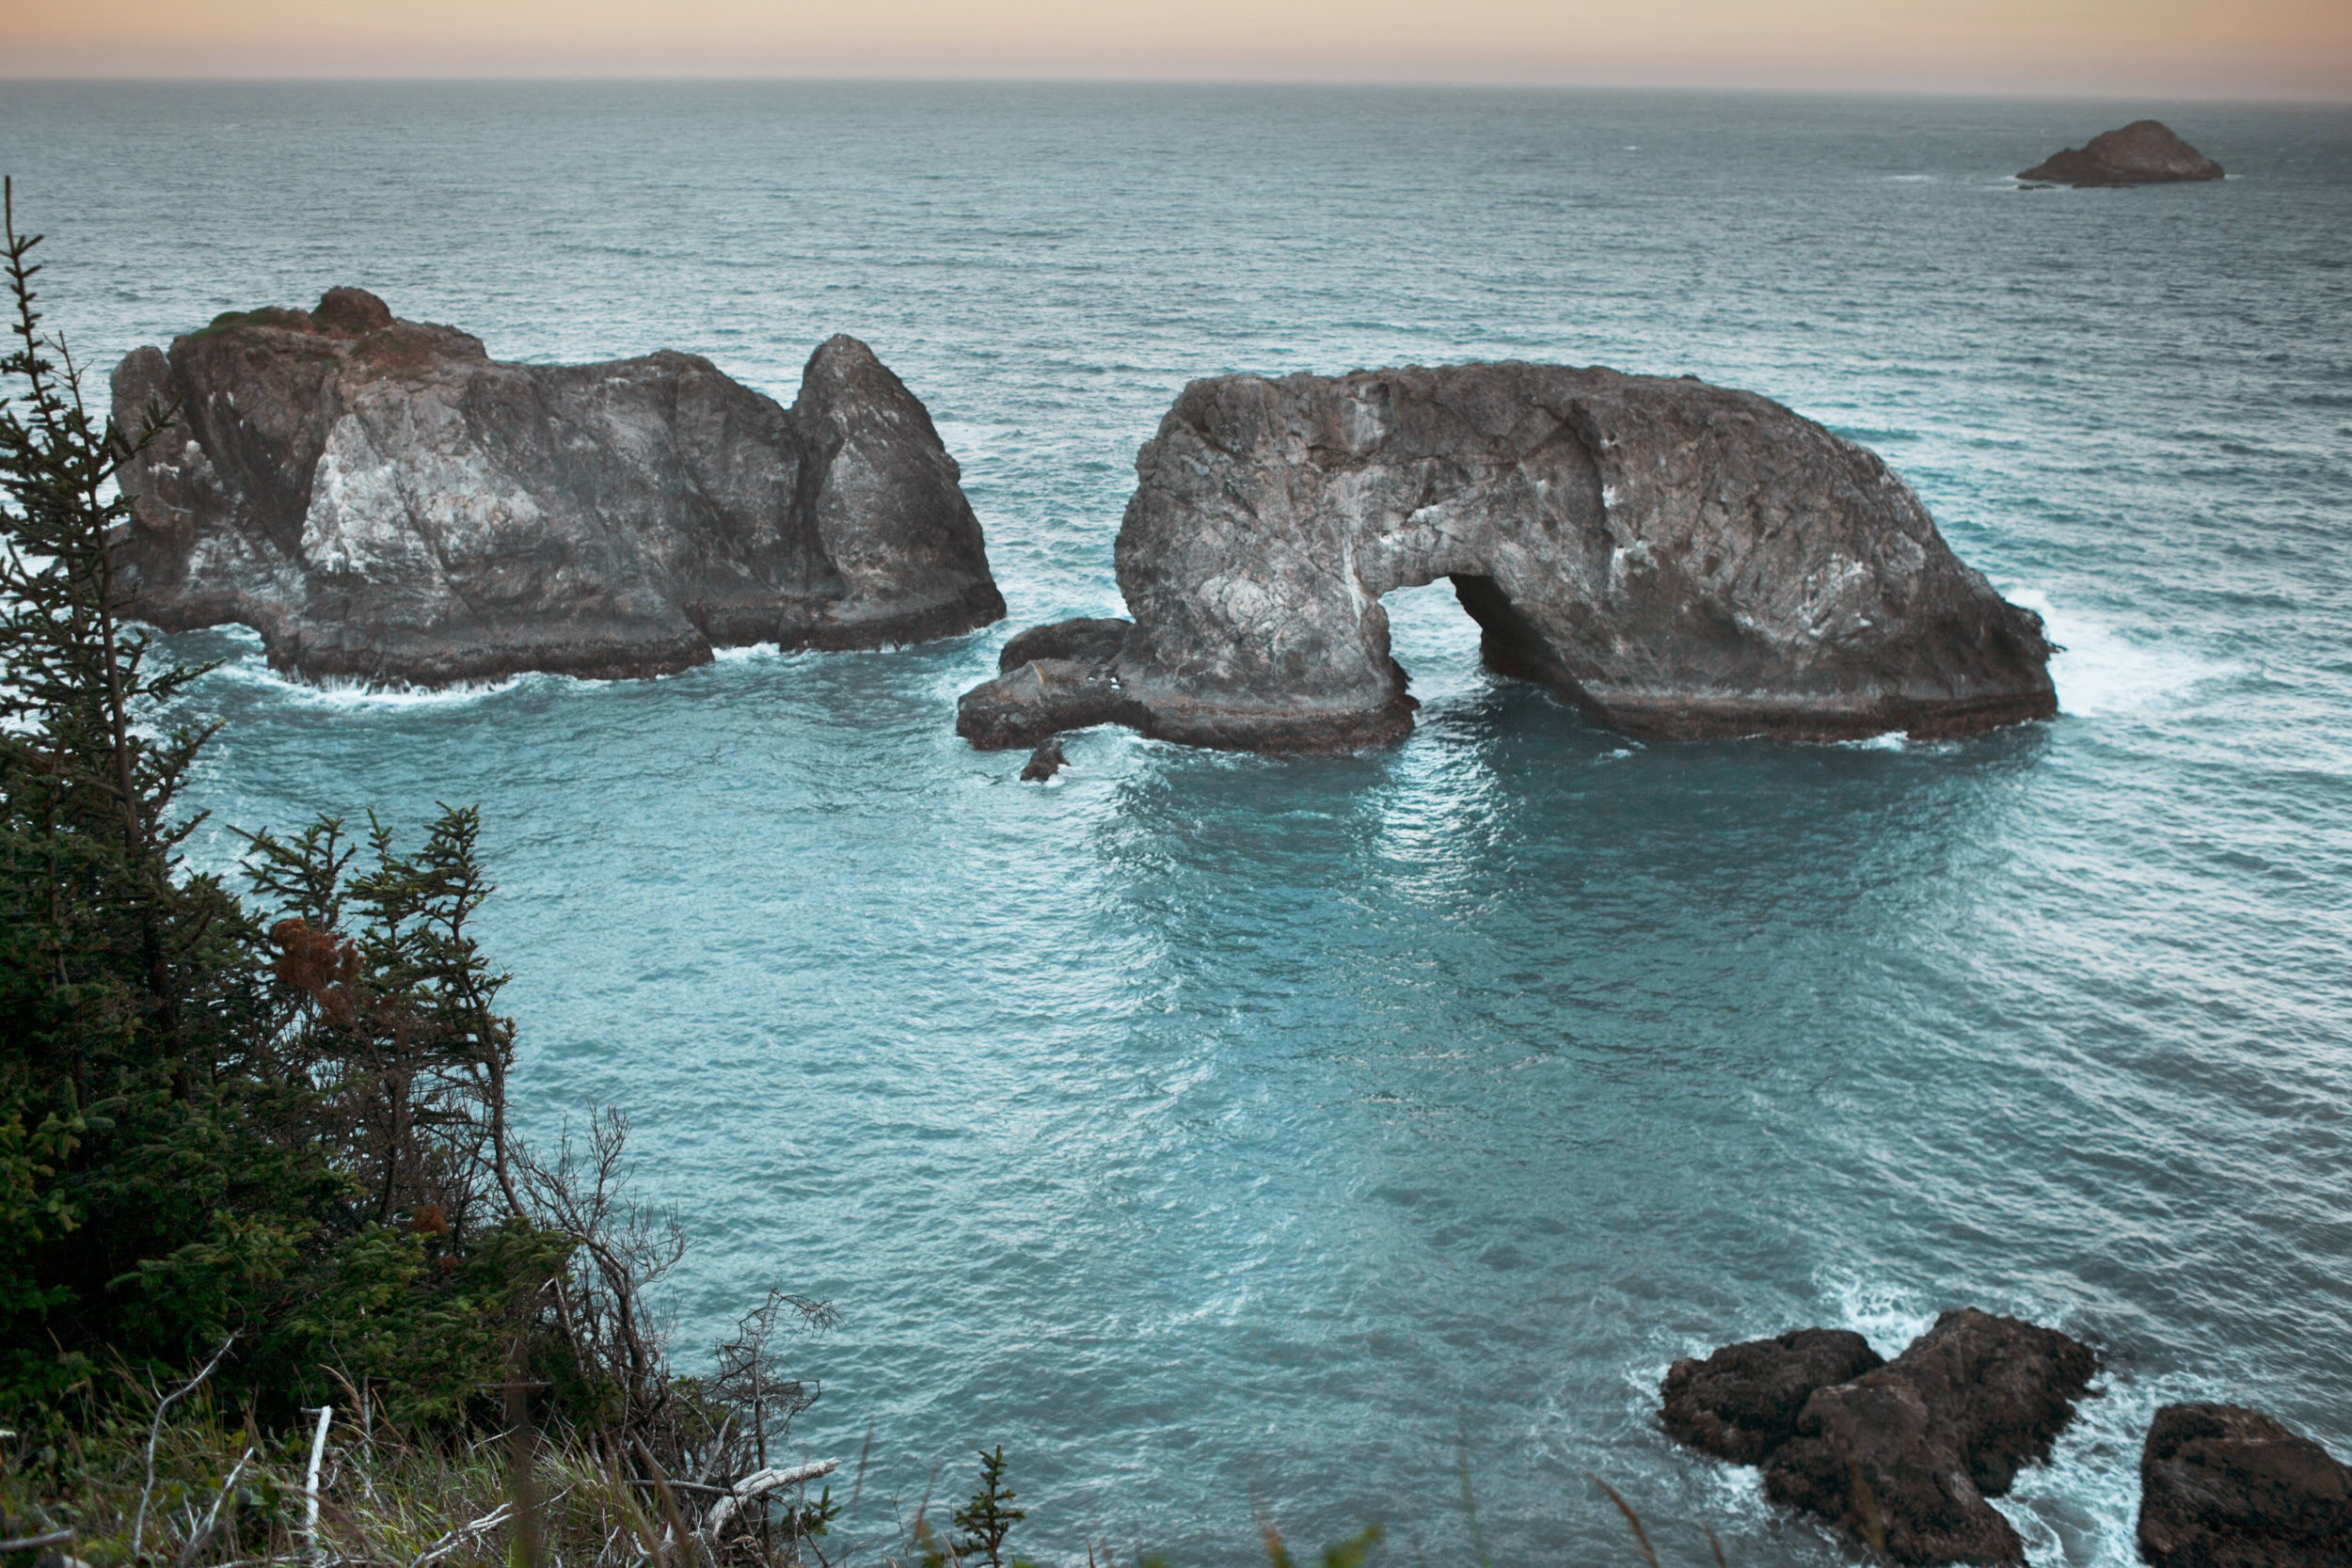 095Travel_Adventure_Outdoor_Photography_Outlive_Creative_Oregon_Coast_Samuel H Boardman State Park.jpg